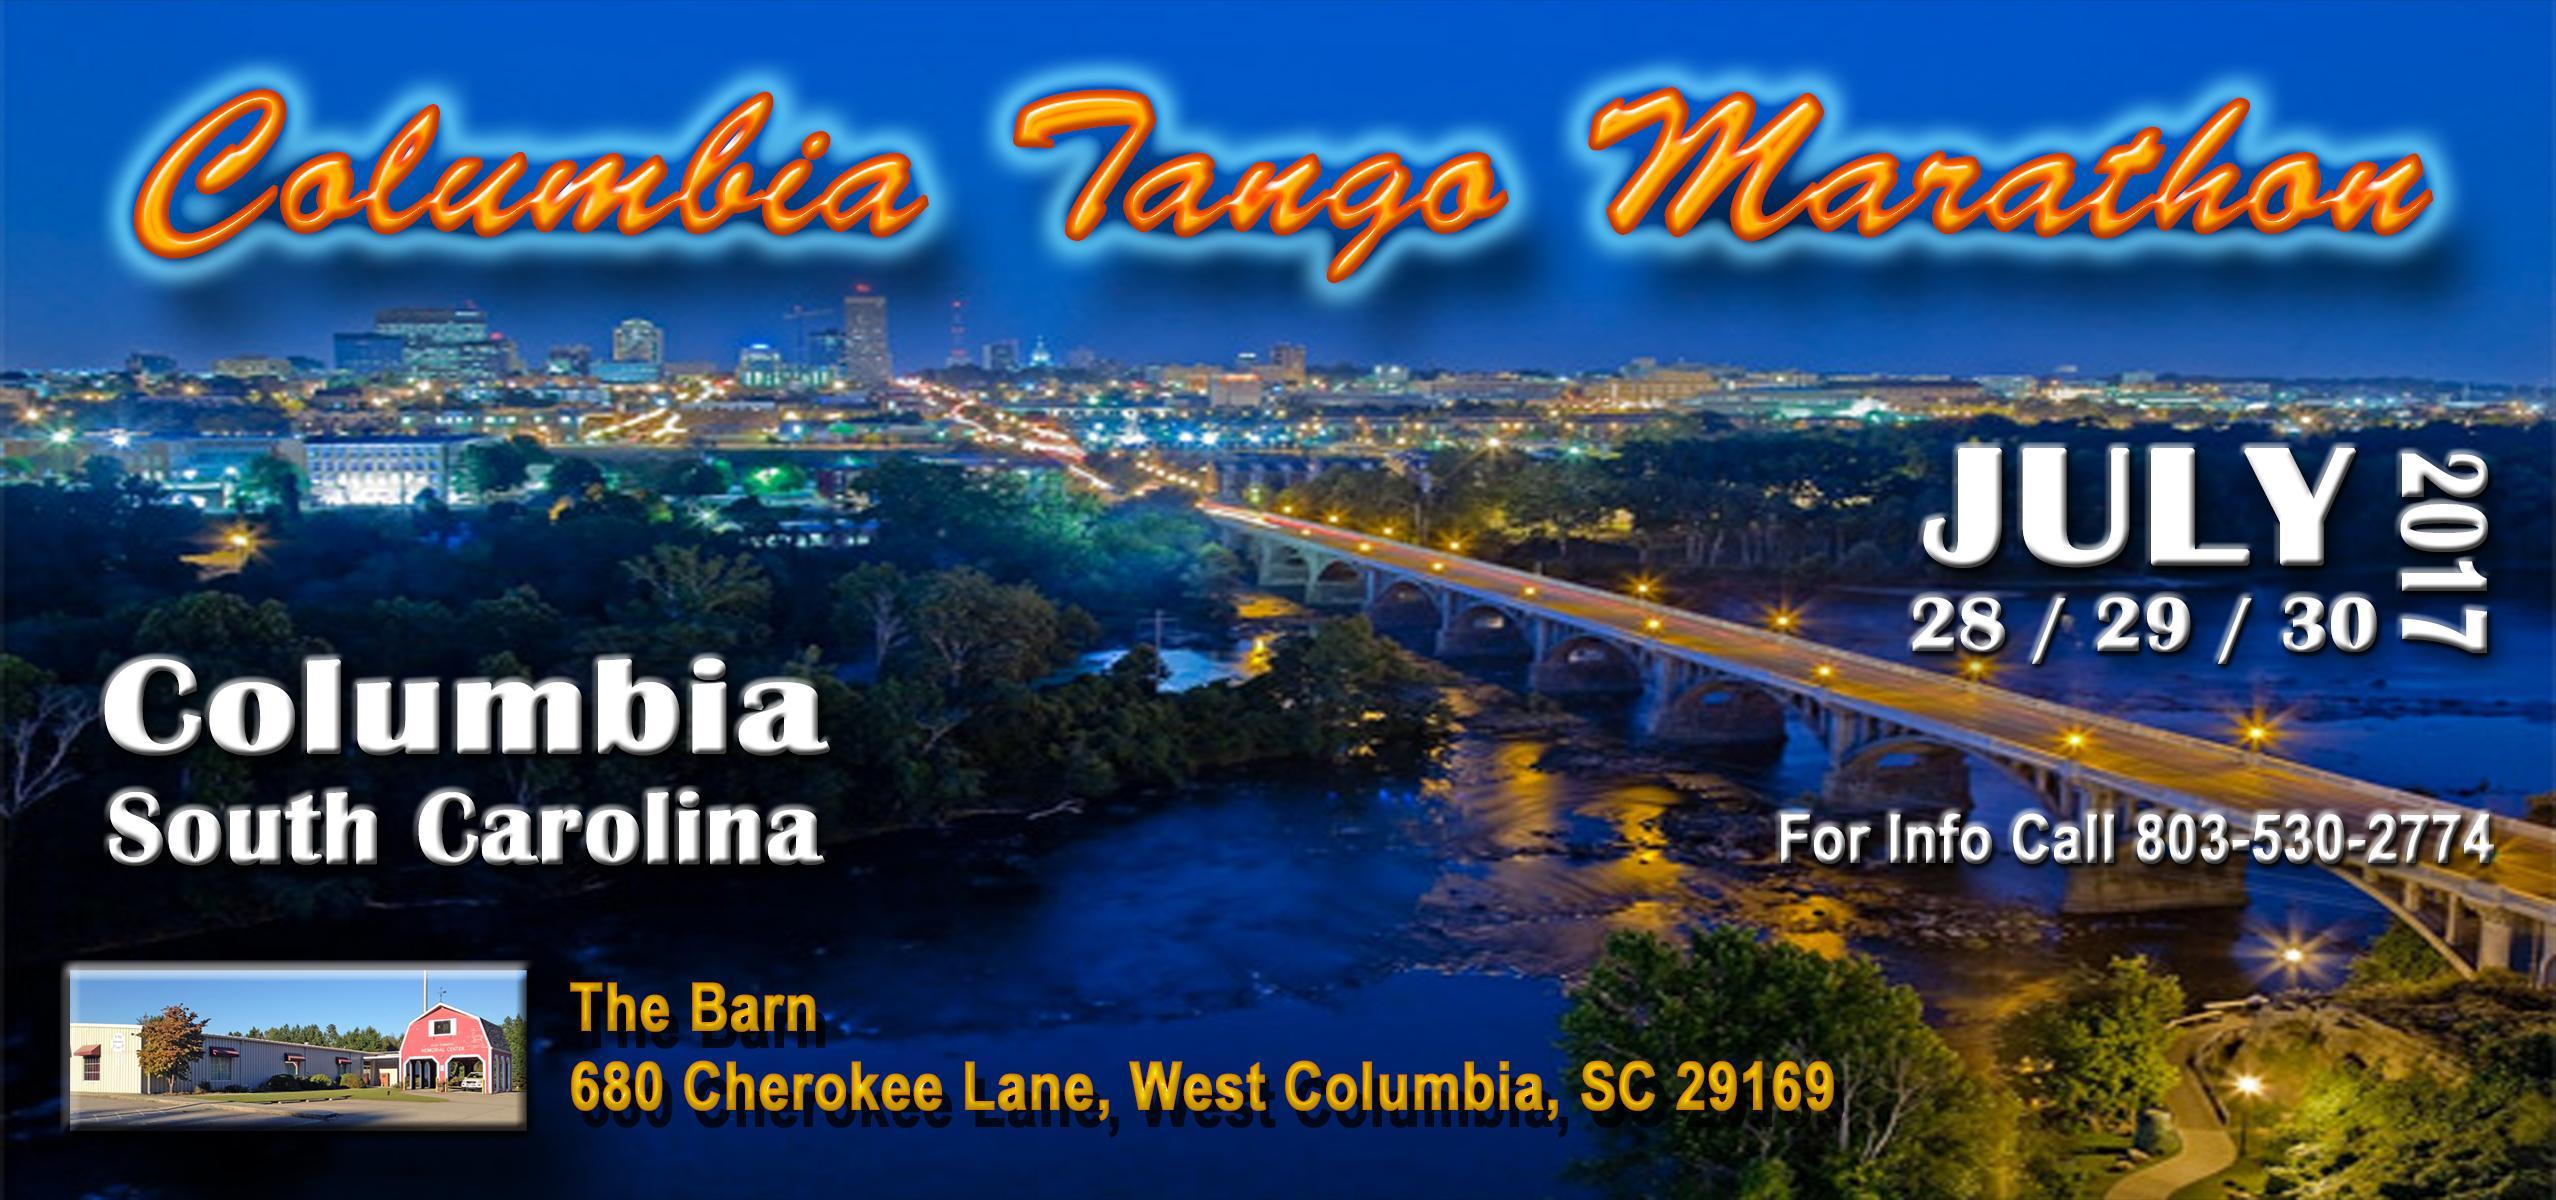 Columbia Tango Marathon